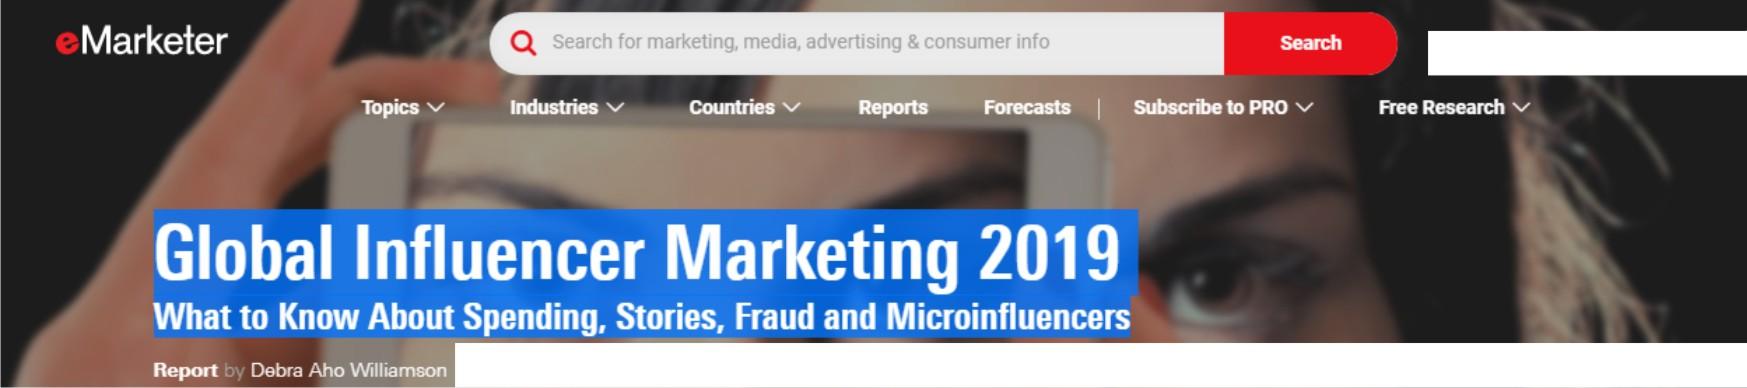 Influencers Marketing Nigeria, Africa